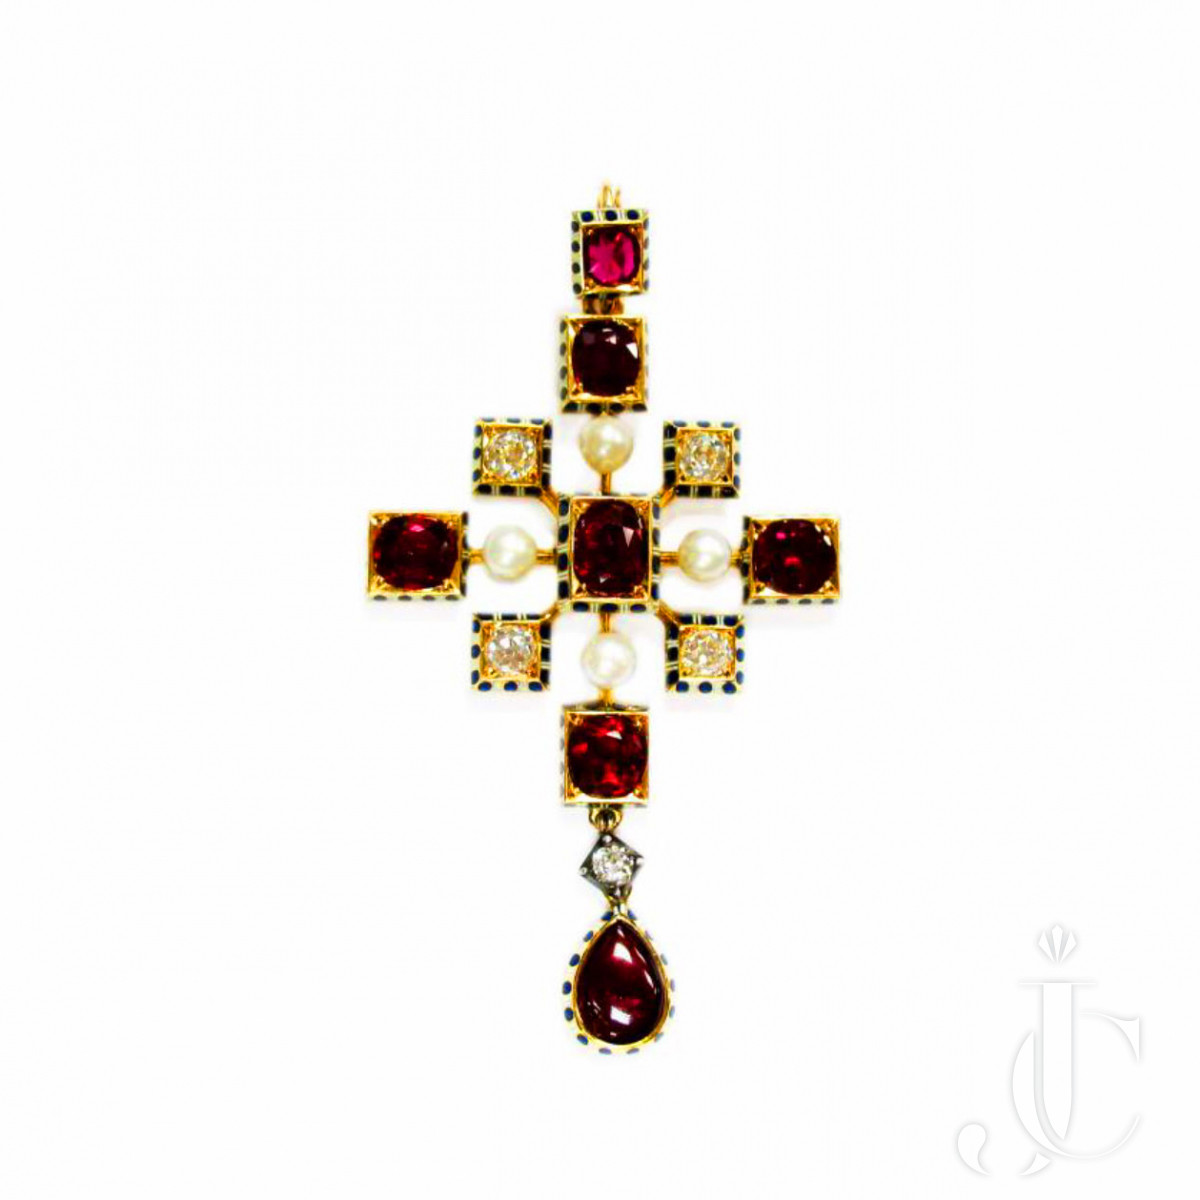 Antique Yellow Gold Ruby and Diamond Enamel Cross, Robert Phillips, circa 1880